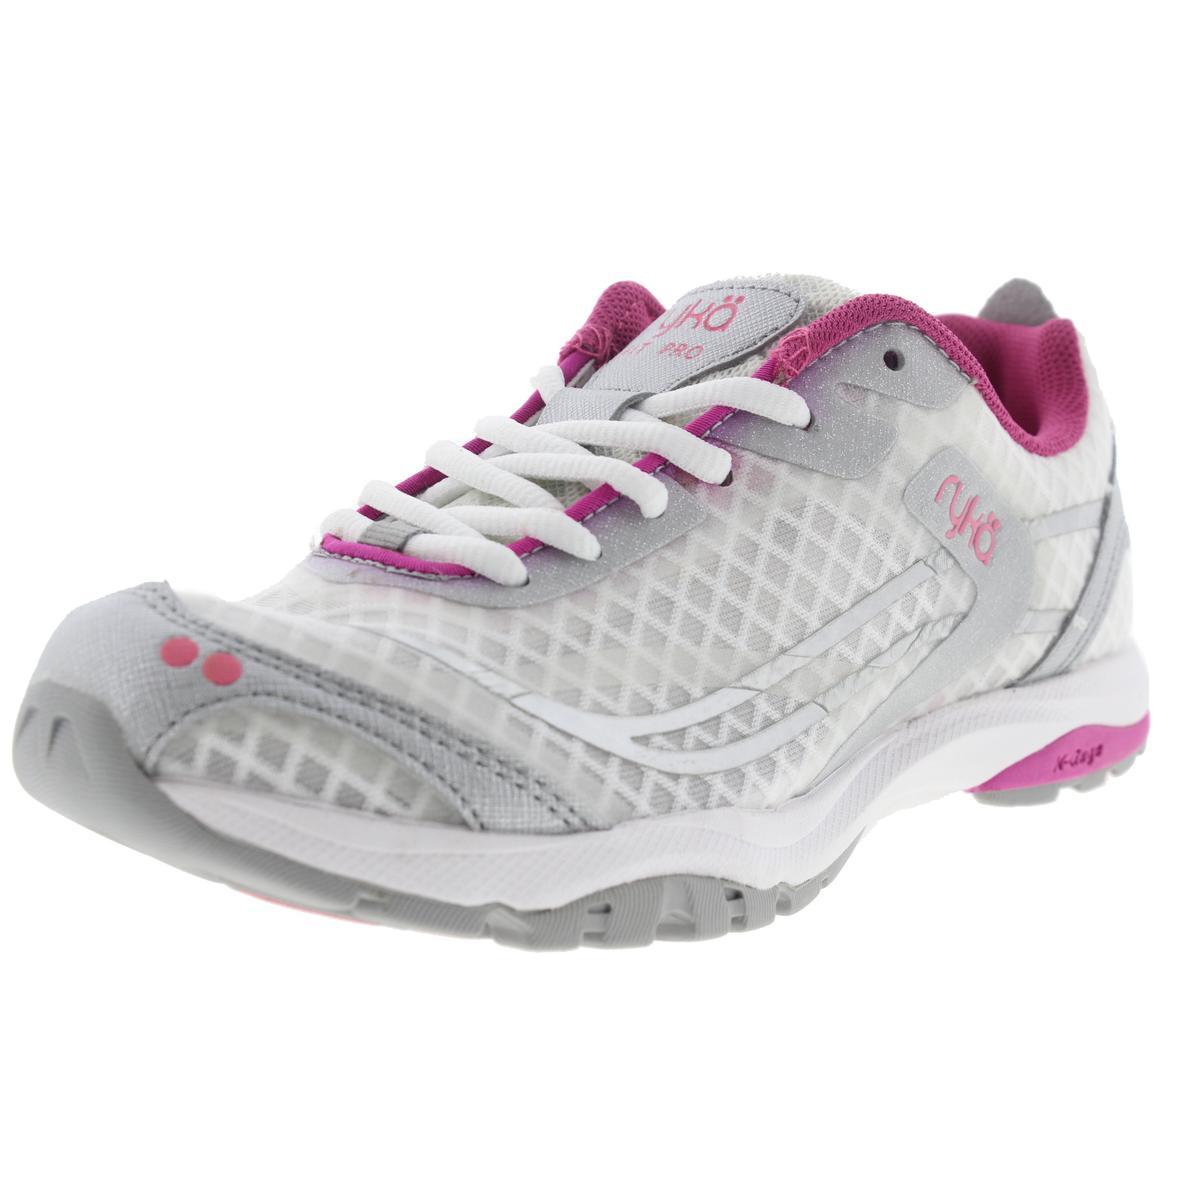 Ryka Womens Training Shoes